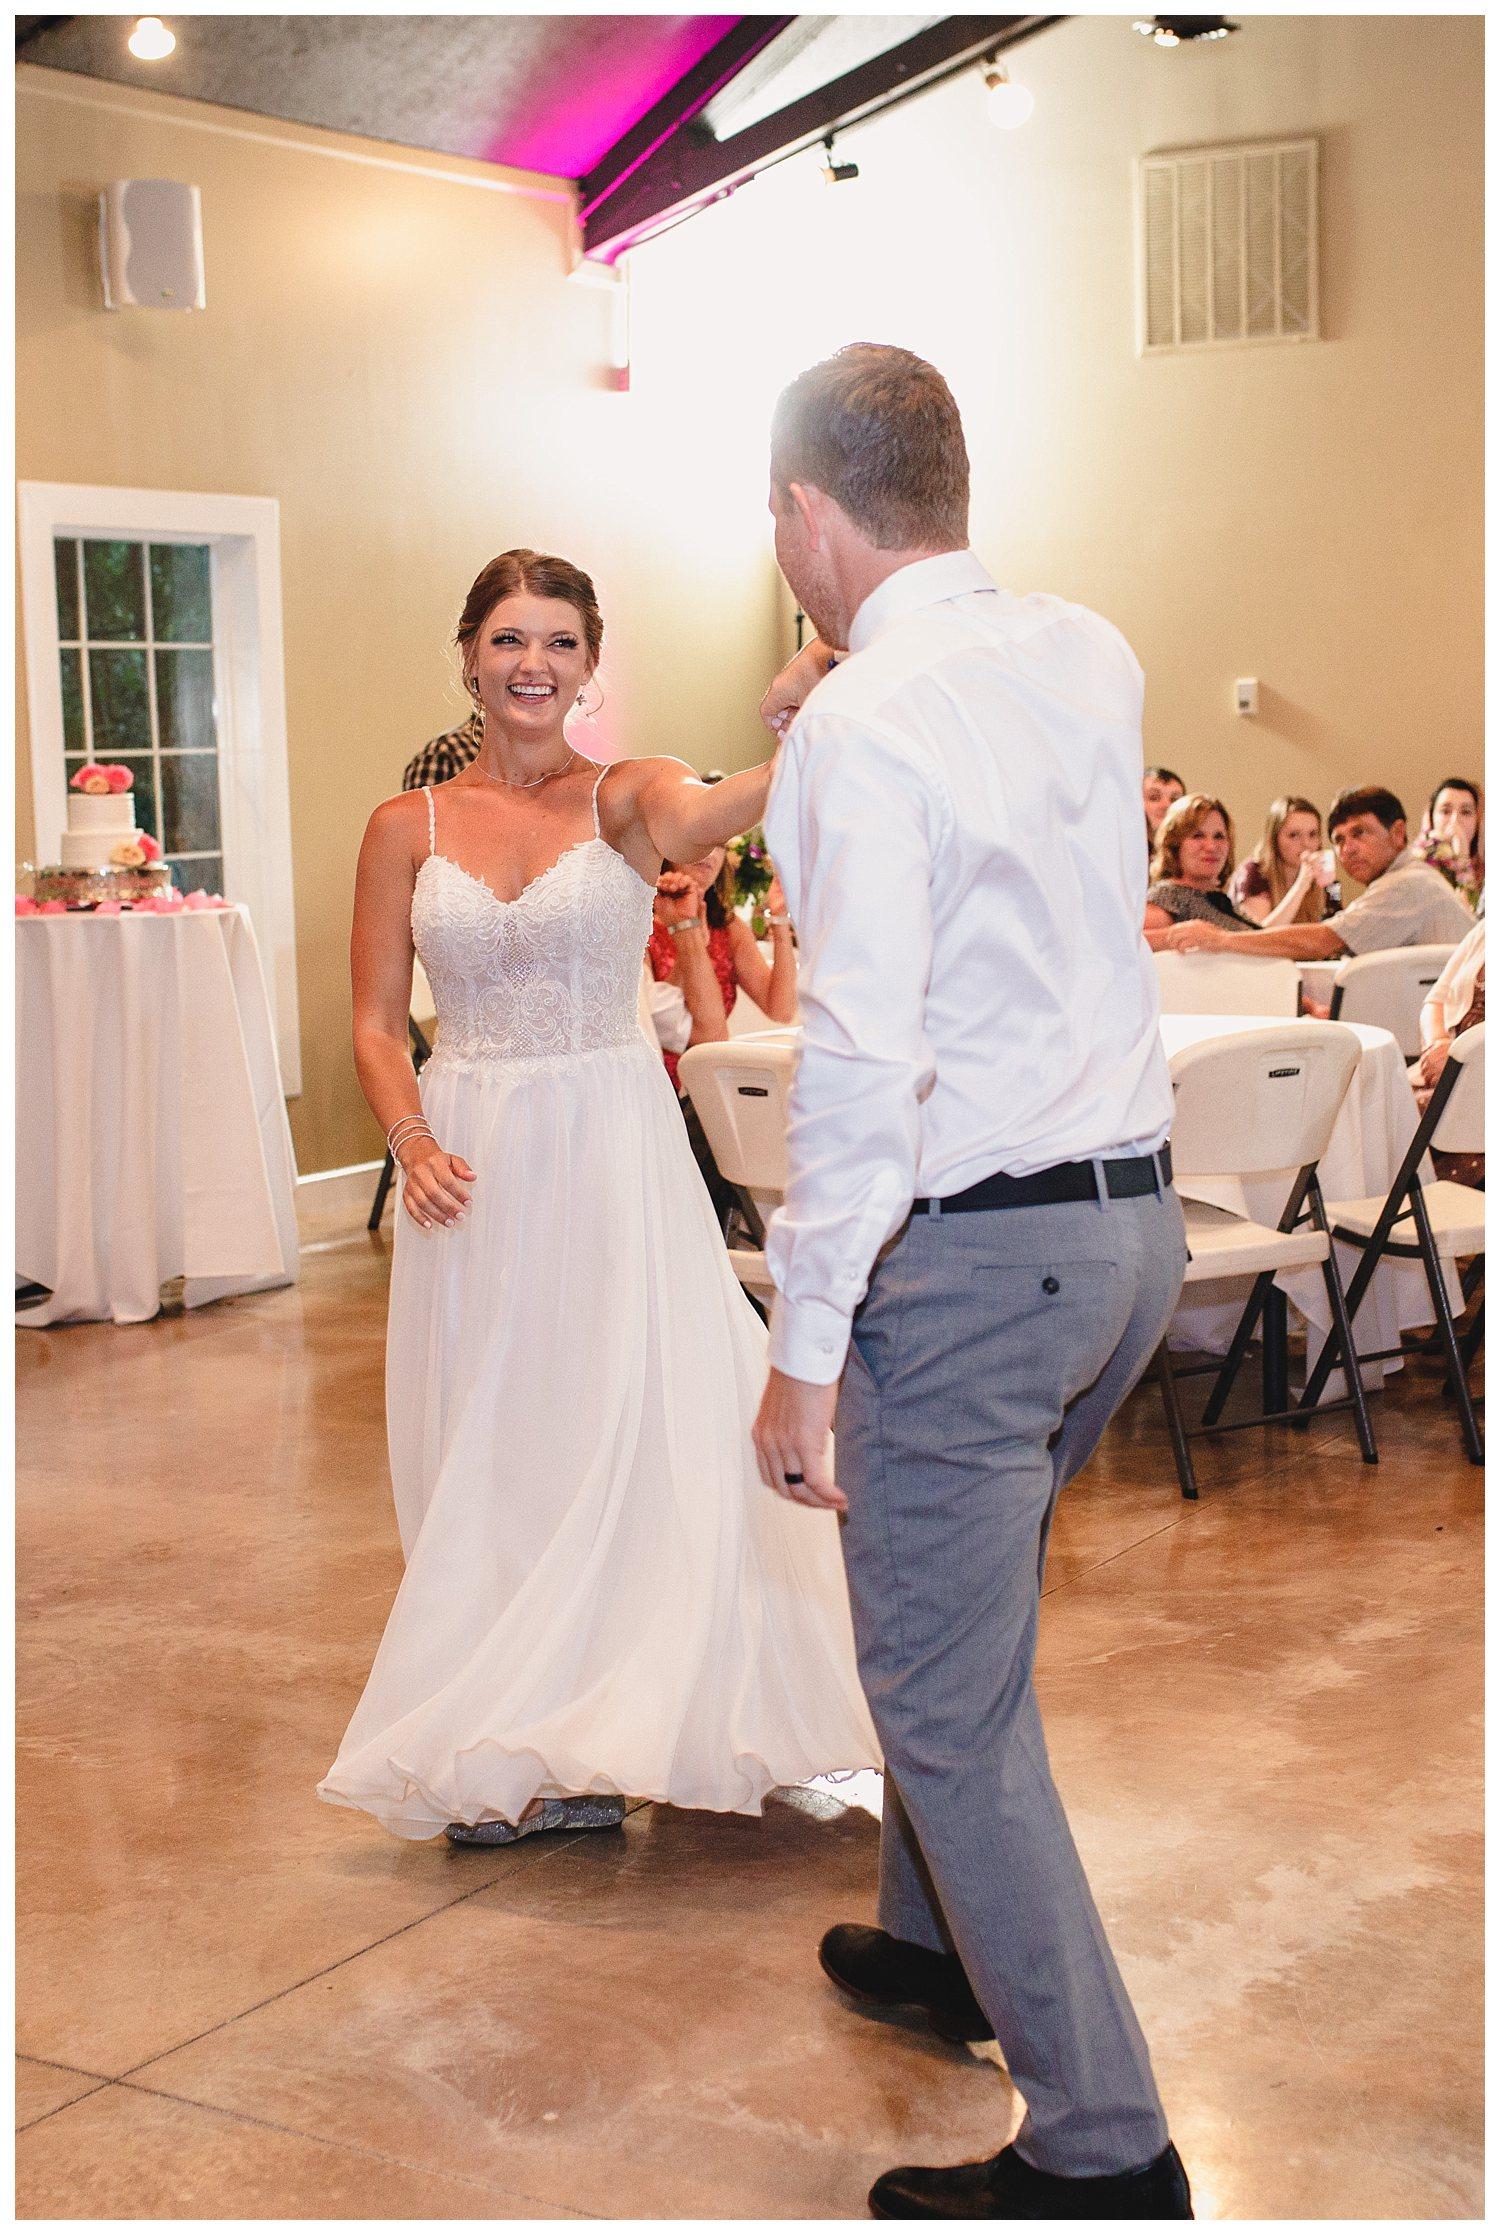 Kelsey_Diane_Photography_Kansas_City_Engagement_Wedding_Photographer_Midwest_Traveling_Missouri_Lee_Andrew_Hall_And_Garden_Blue_Springs_Wedding_Clayton_Kimberly_Summer_Wedding_0846.jpg